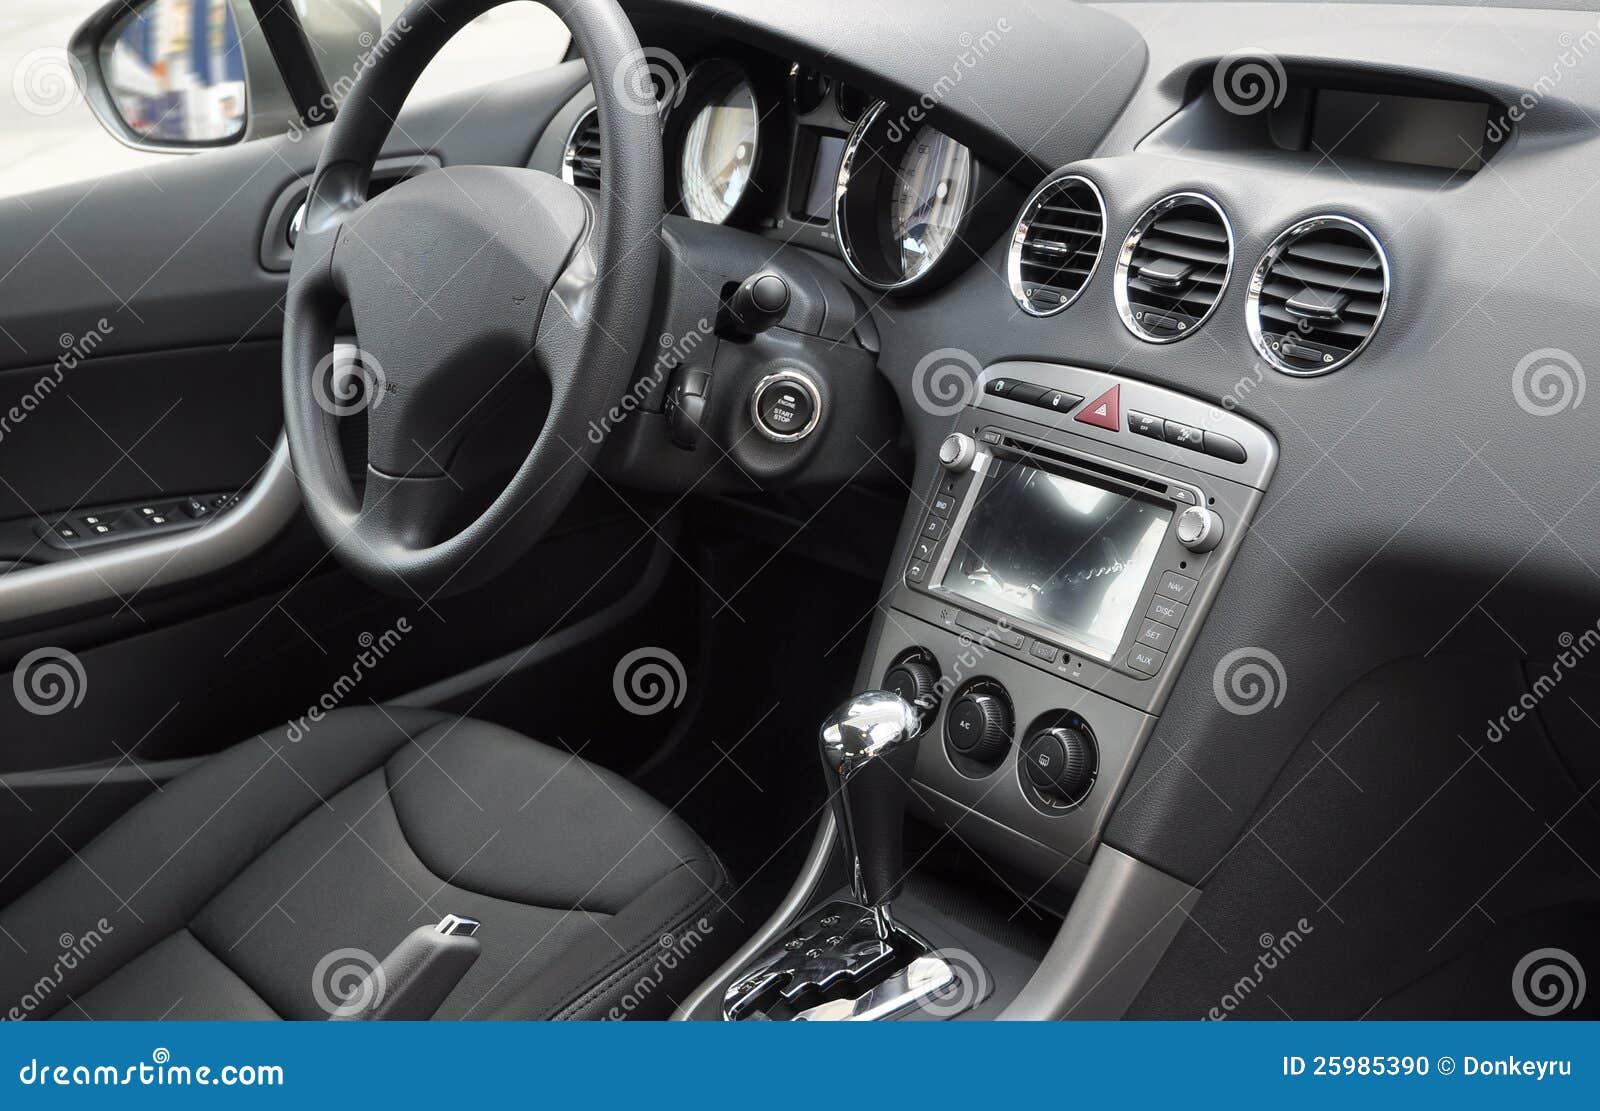 business car interior stock photo image 25985390. Black Bedroom Furniture Sets. Home Design Ideas